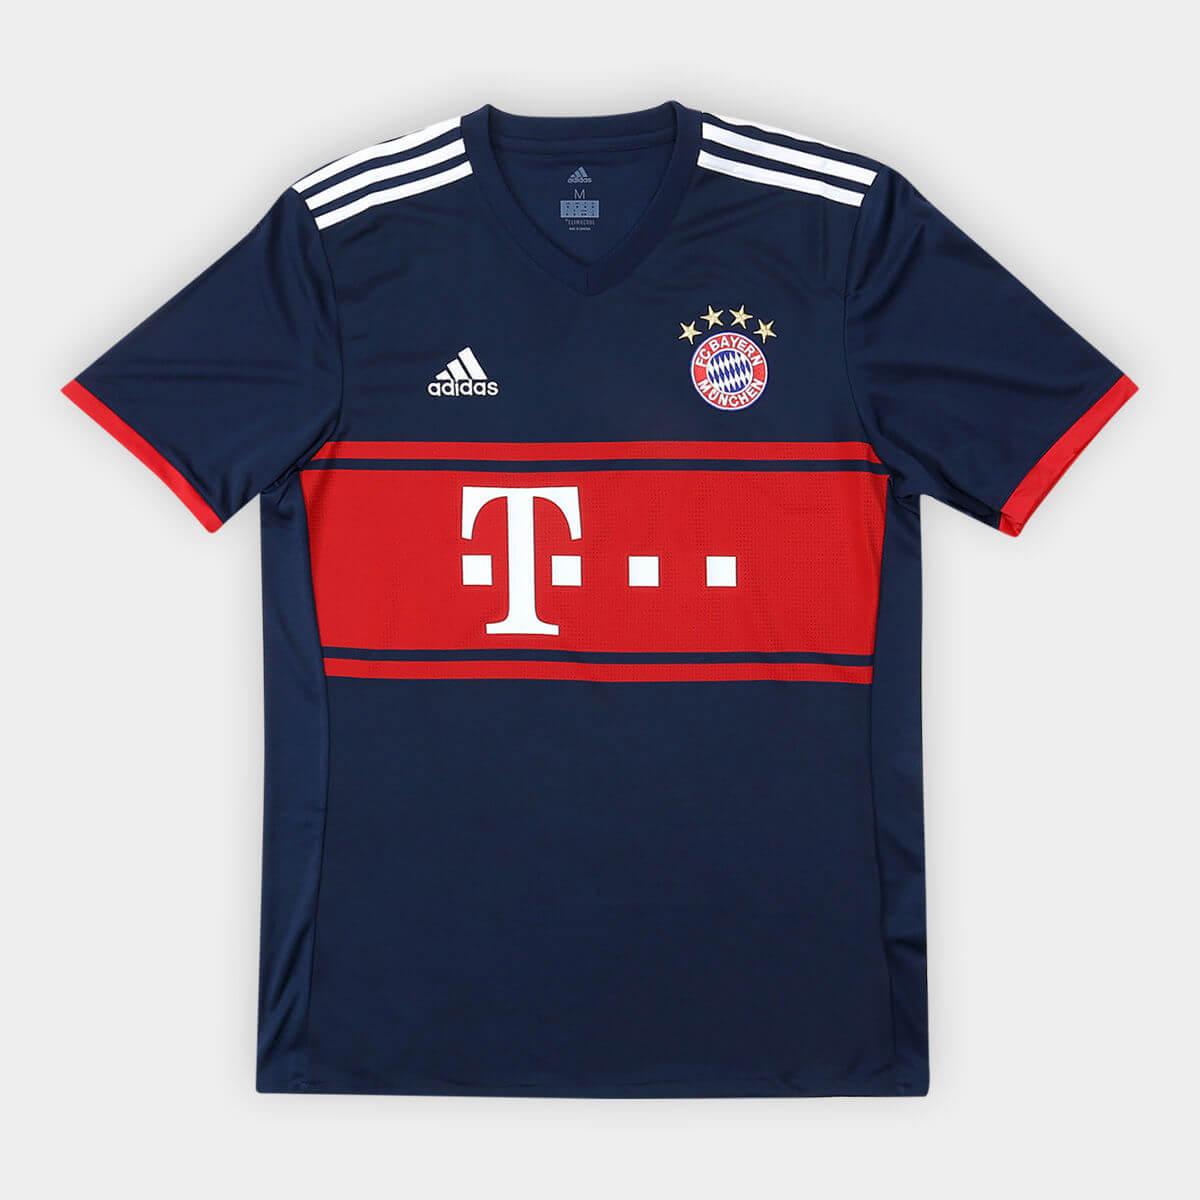 camisa bayern - Camisa Bayern de Munique 17/18 - R$ 135,92